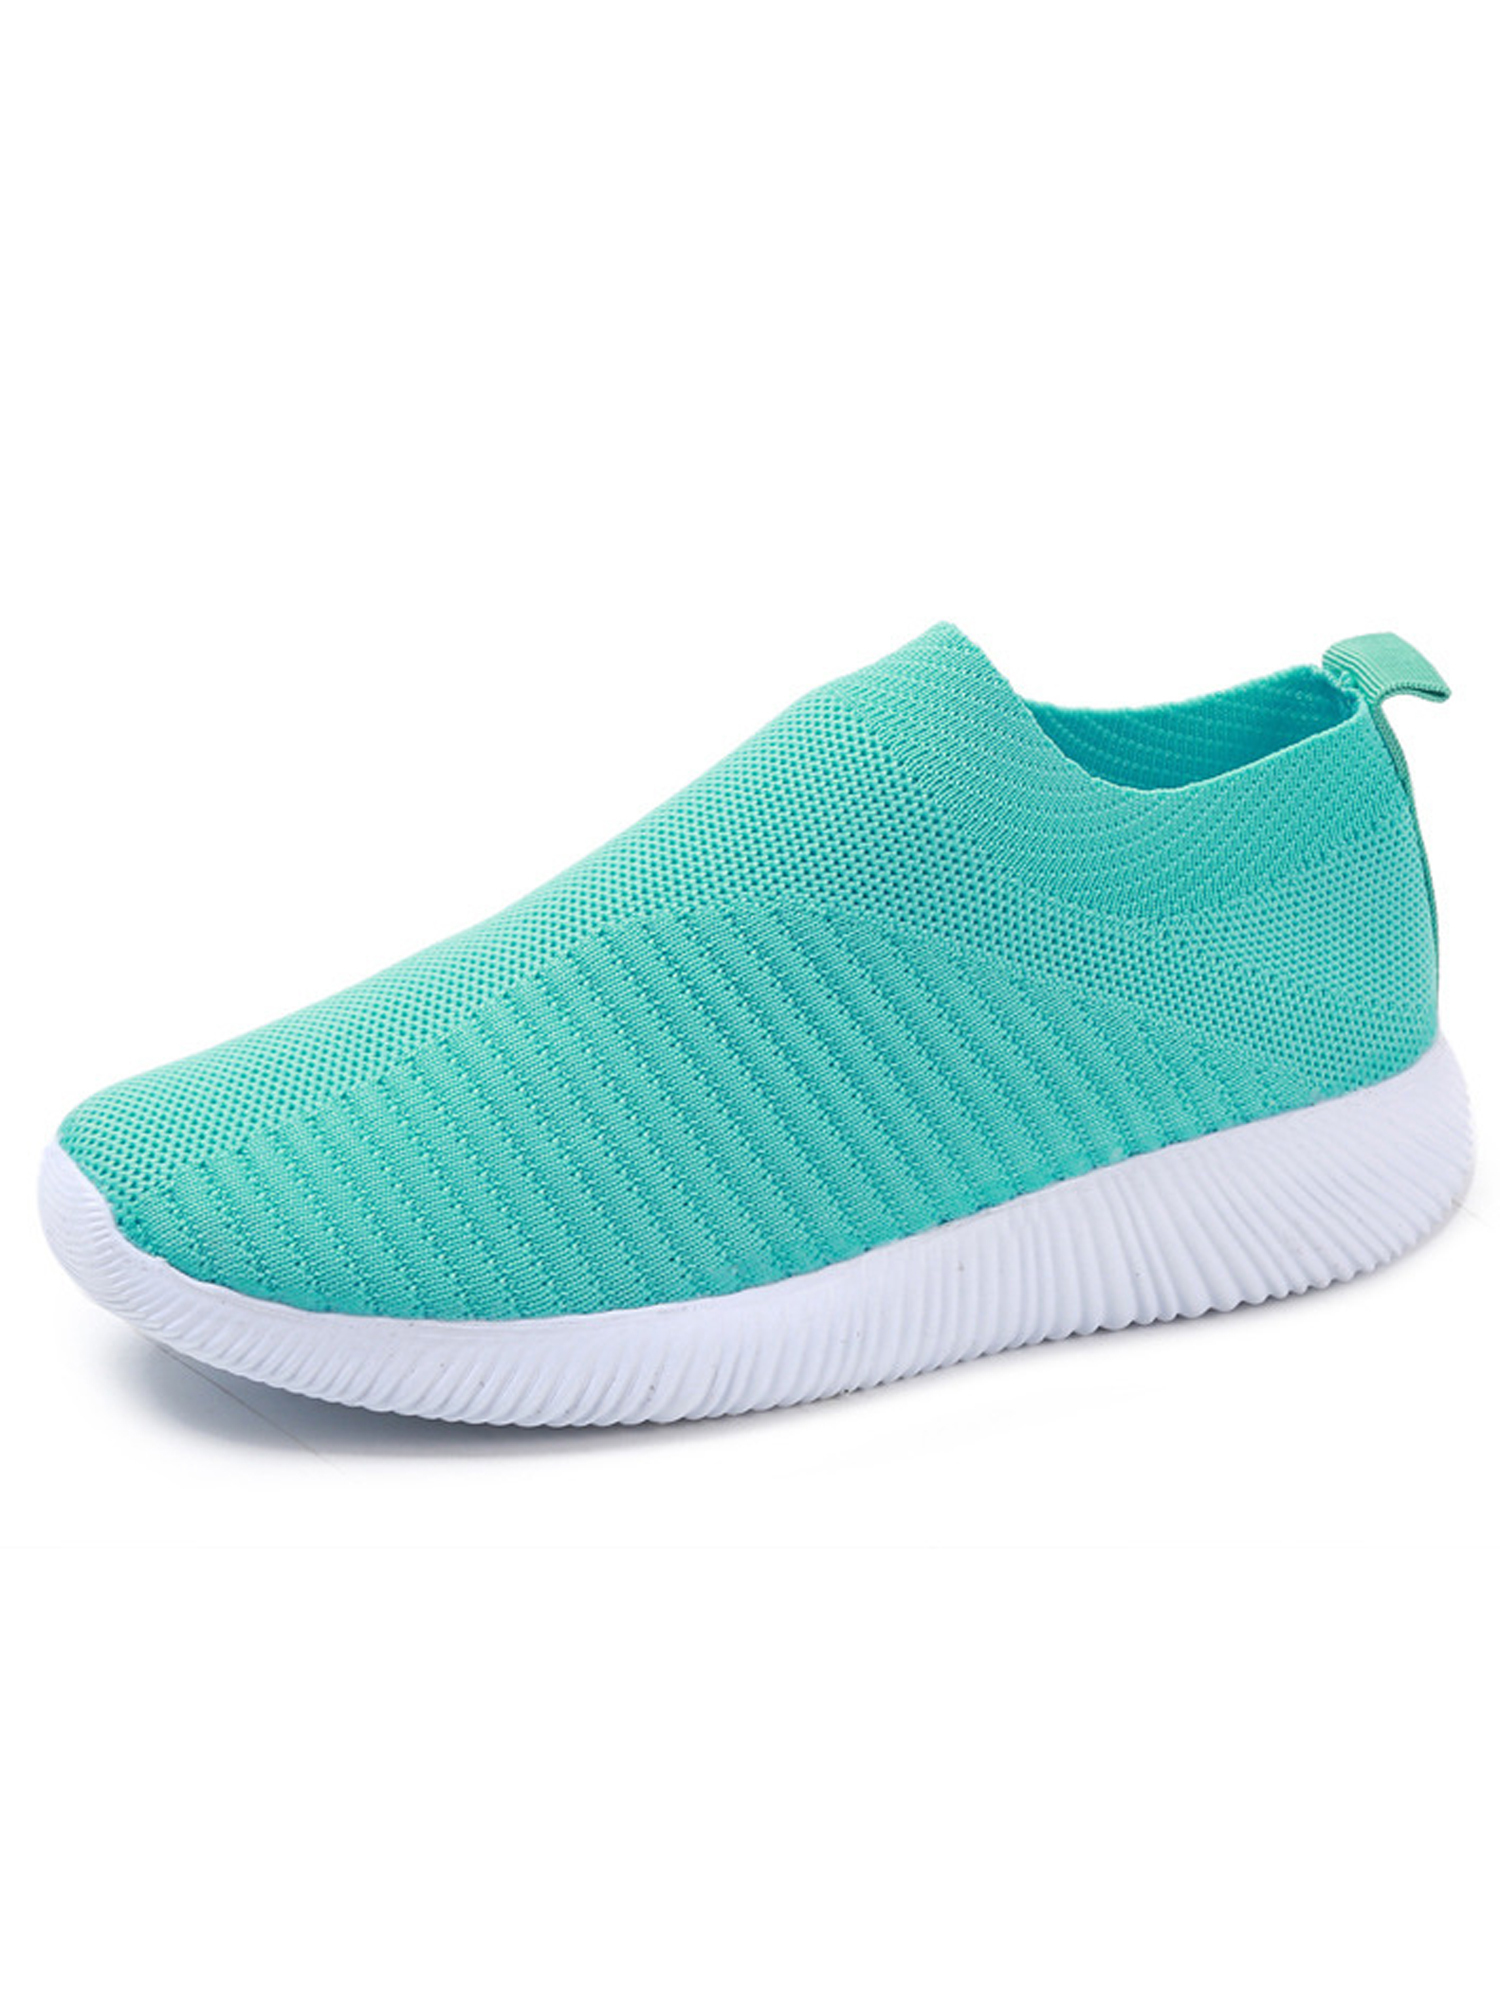 Women's Mesh Comfy Sock Shoes Slip On